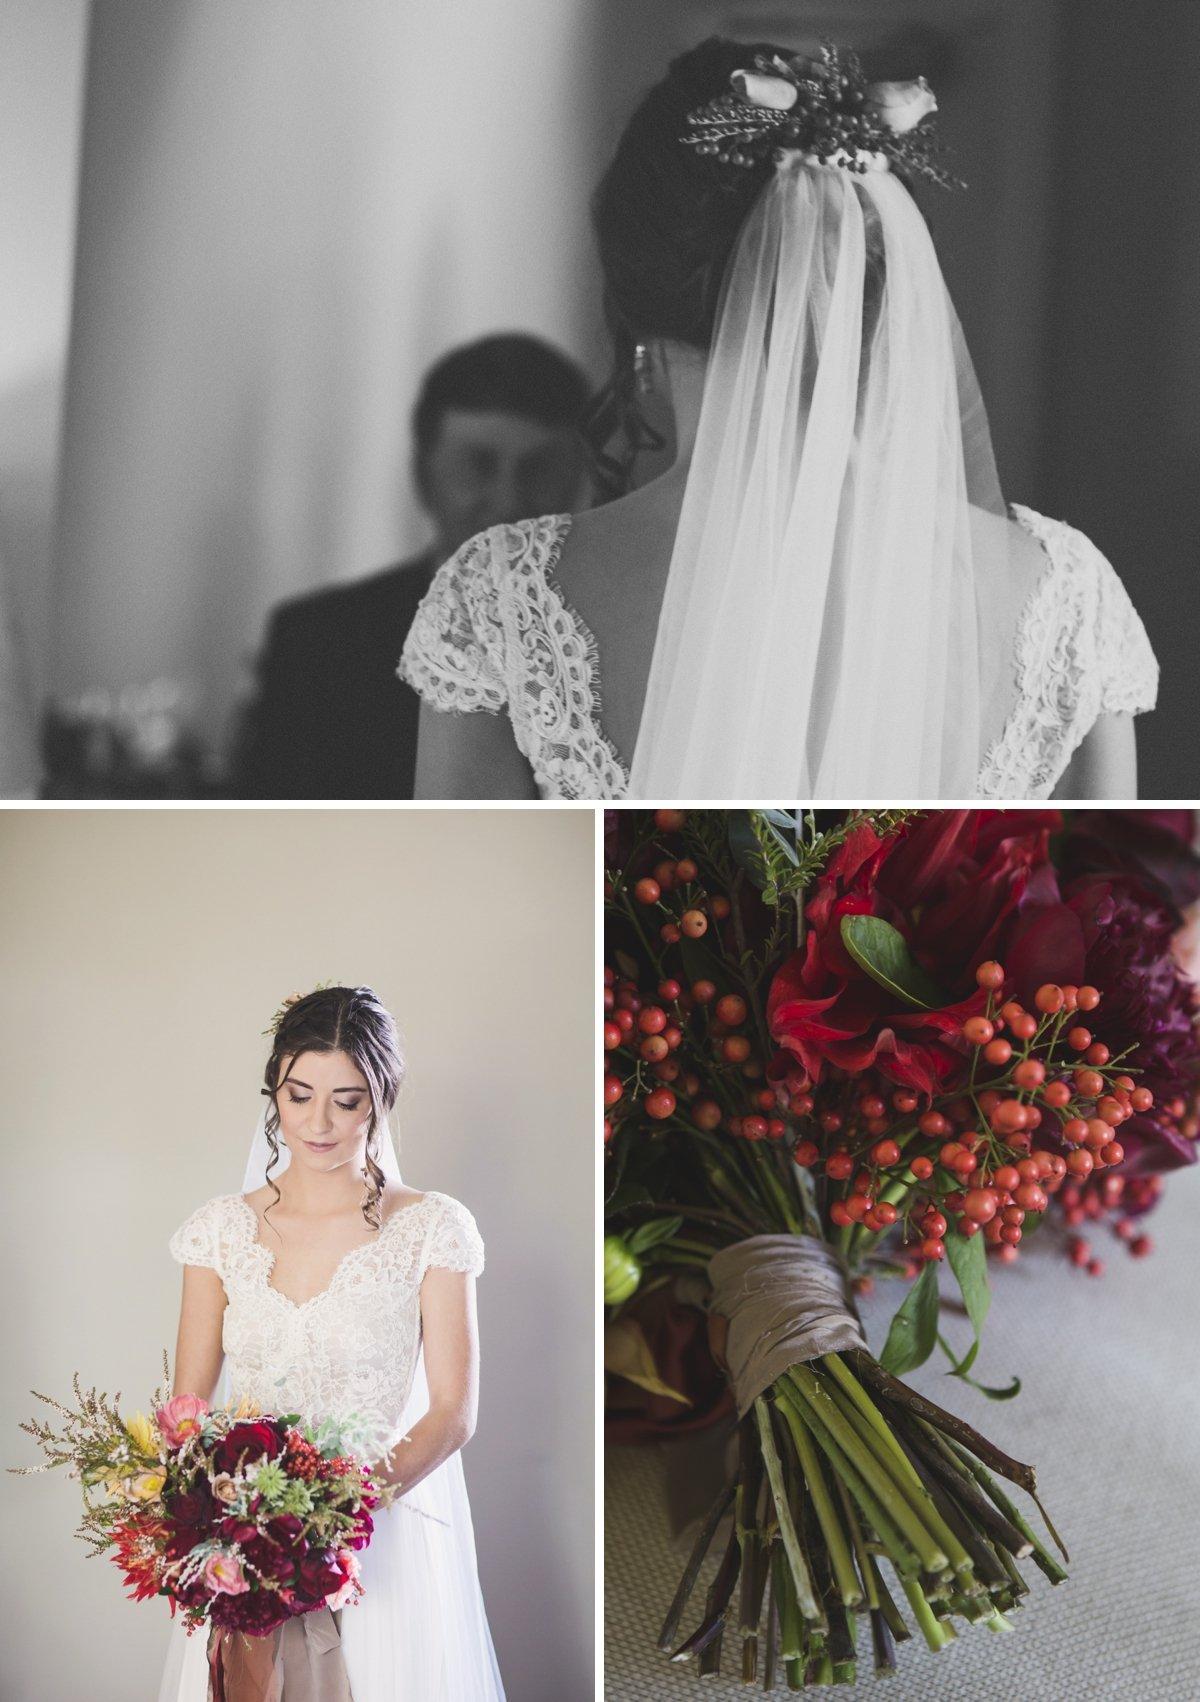 Wagga Wagga Wedding Photographer at Borambola Winery Wagga Wagga Albury wedding photographer Culcairn wedding venue_1160